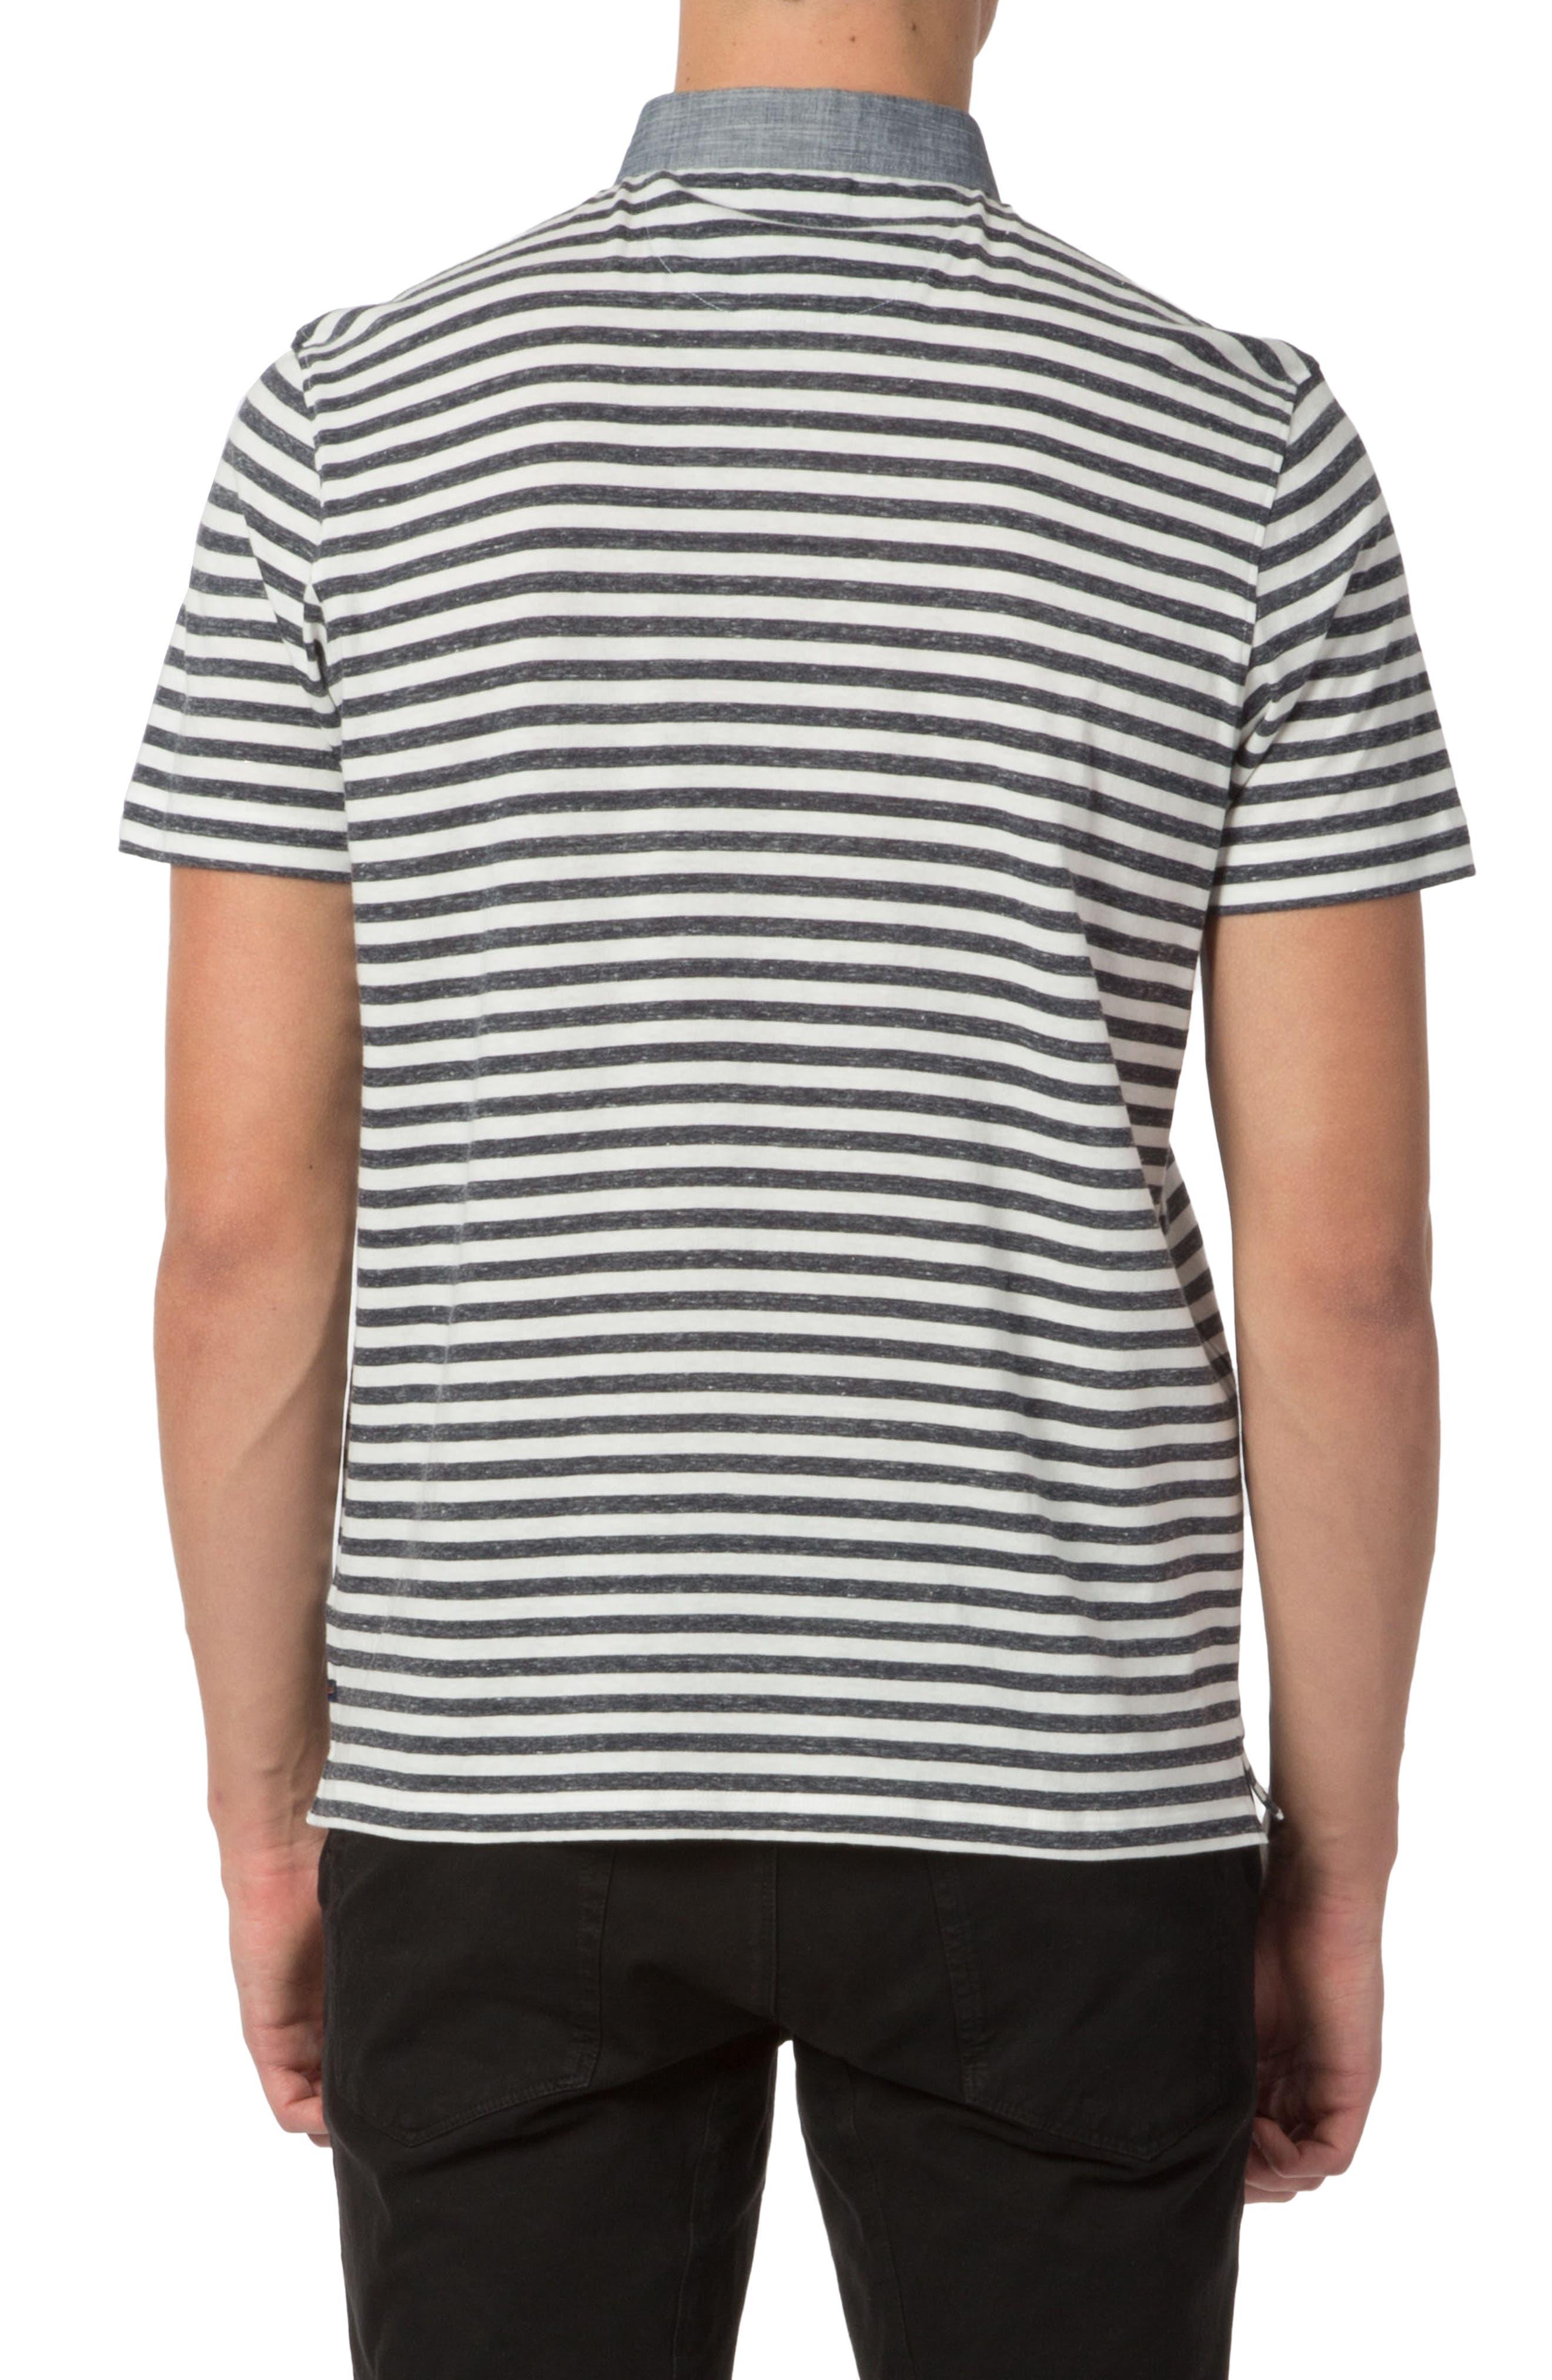 Alternate Image 2  - Good Man Brand Trim Fit Stripe Linen Polo